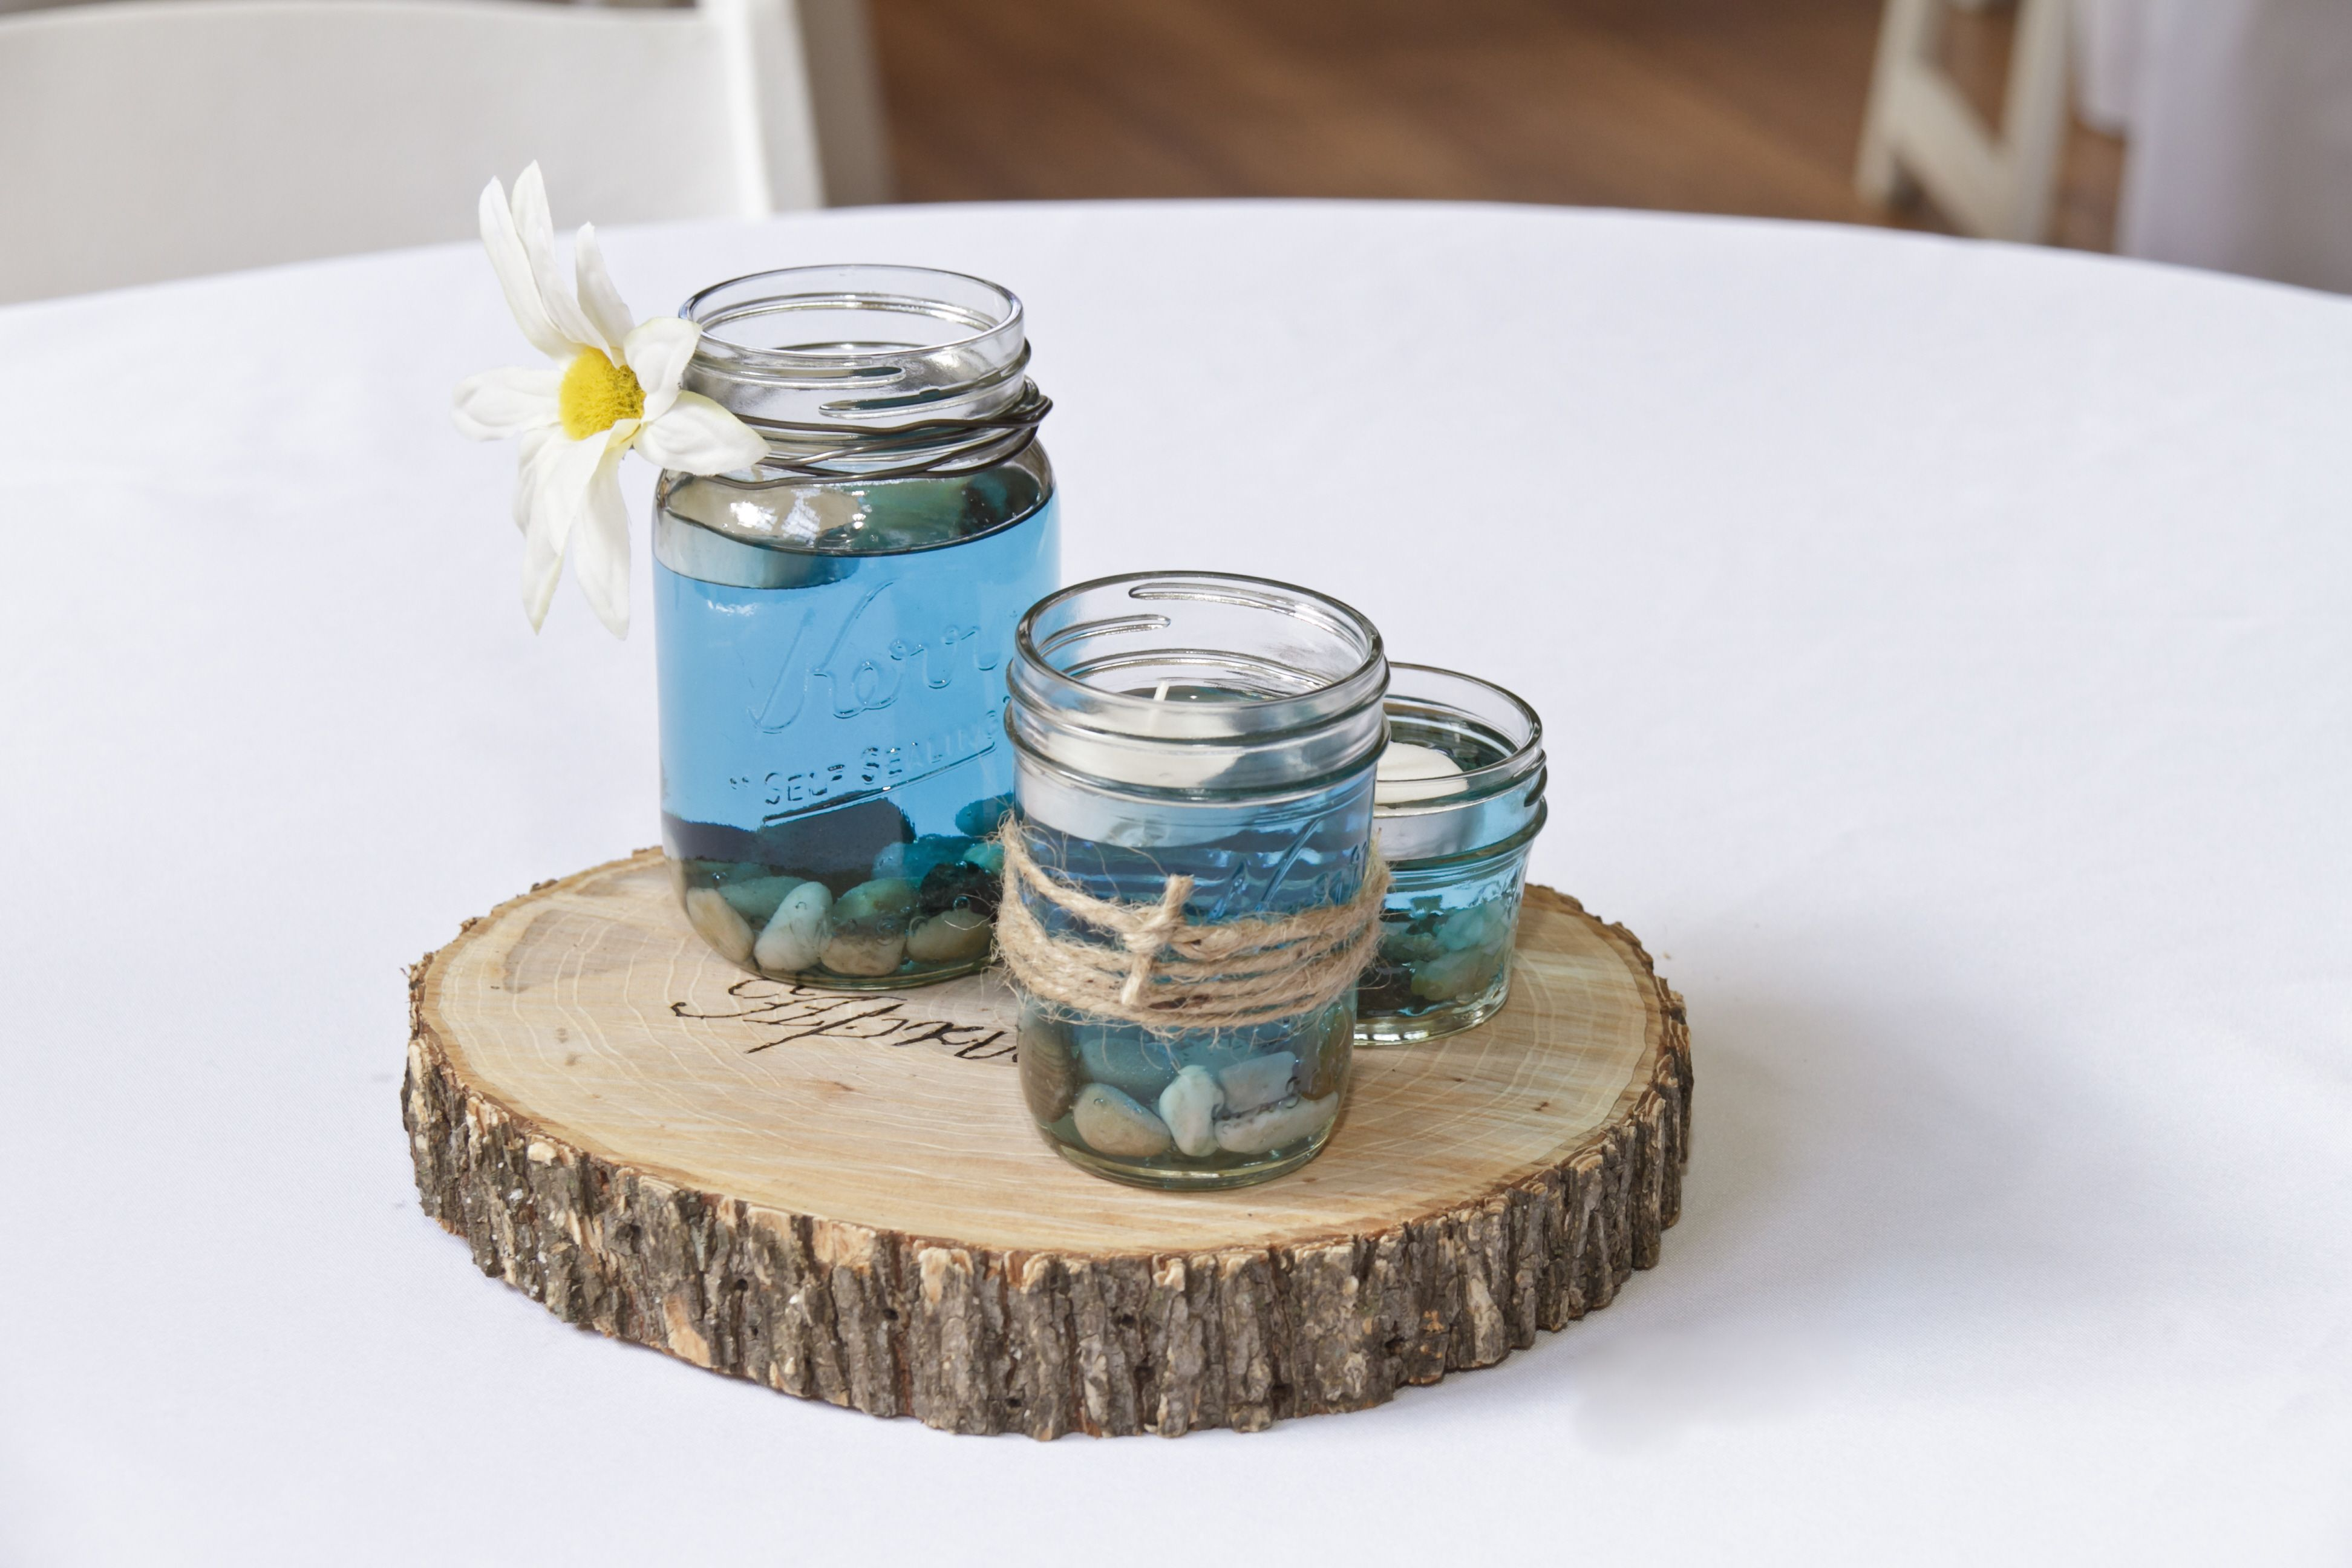 Engraved wood centerpiece wedding ideas pinterest centerpieces